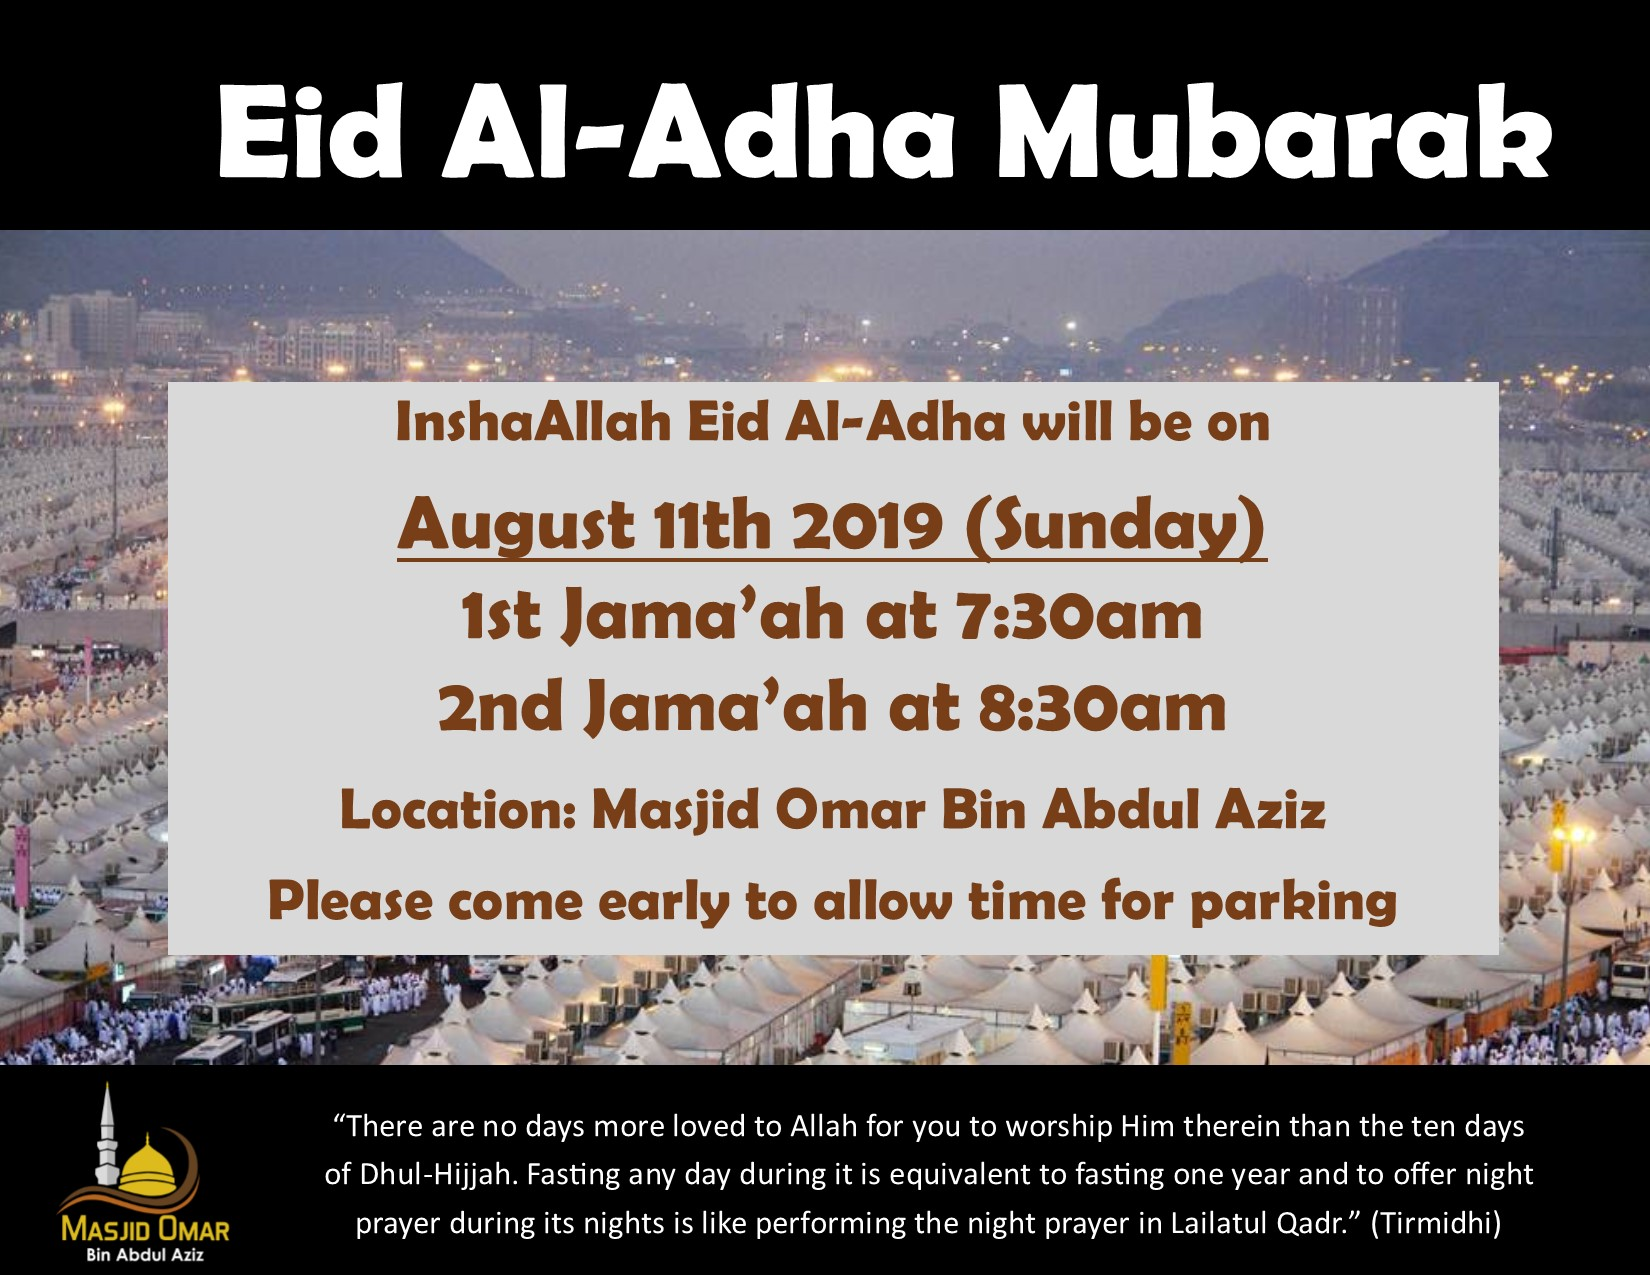 Home | Masjid Omar Bin Abdul Aziz